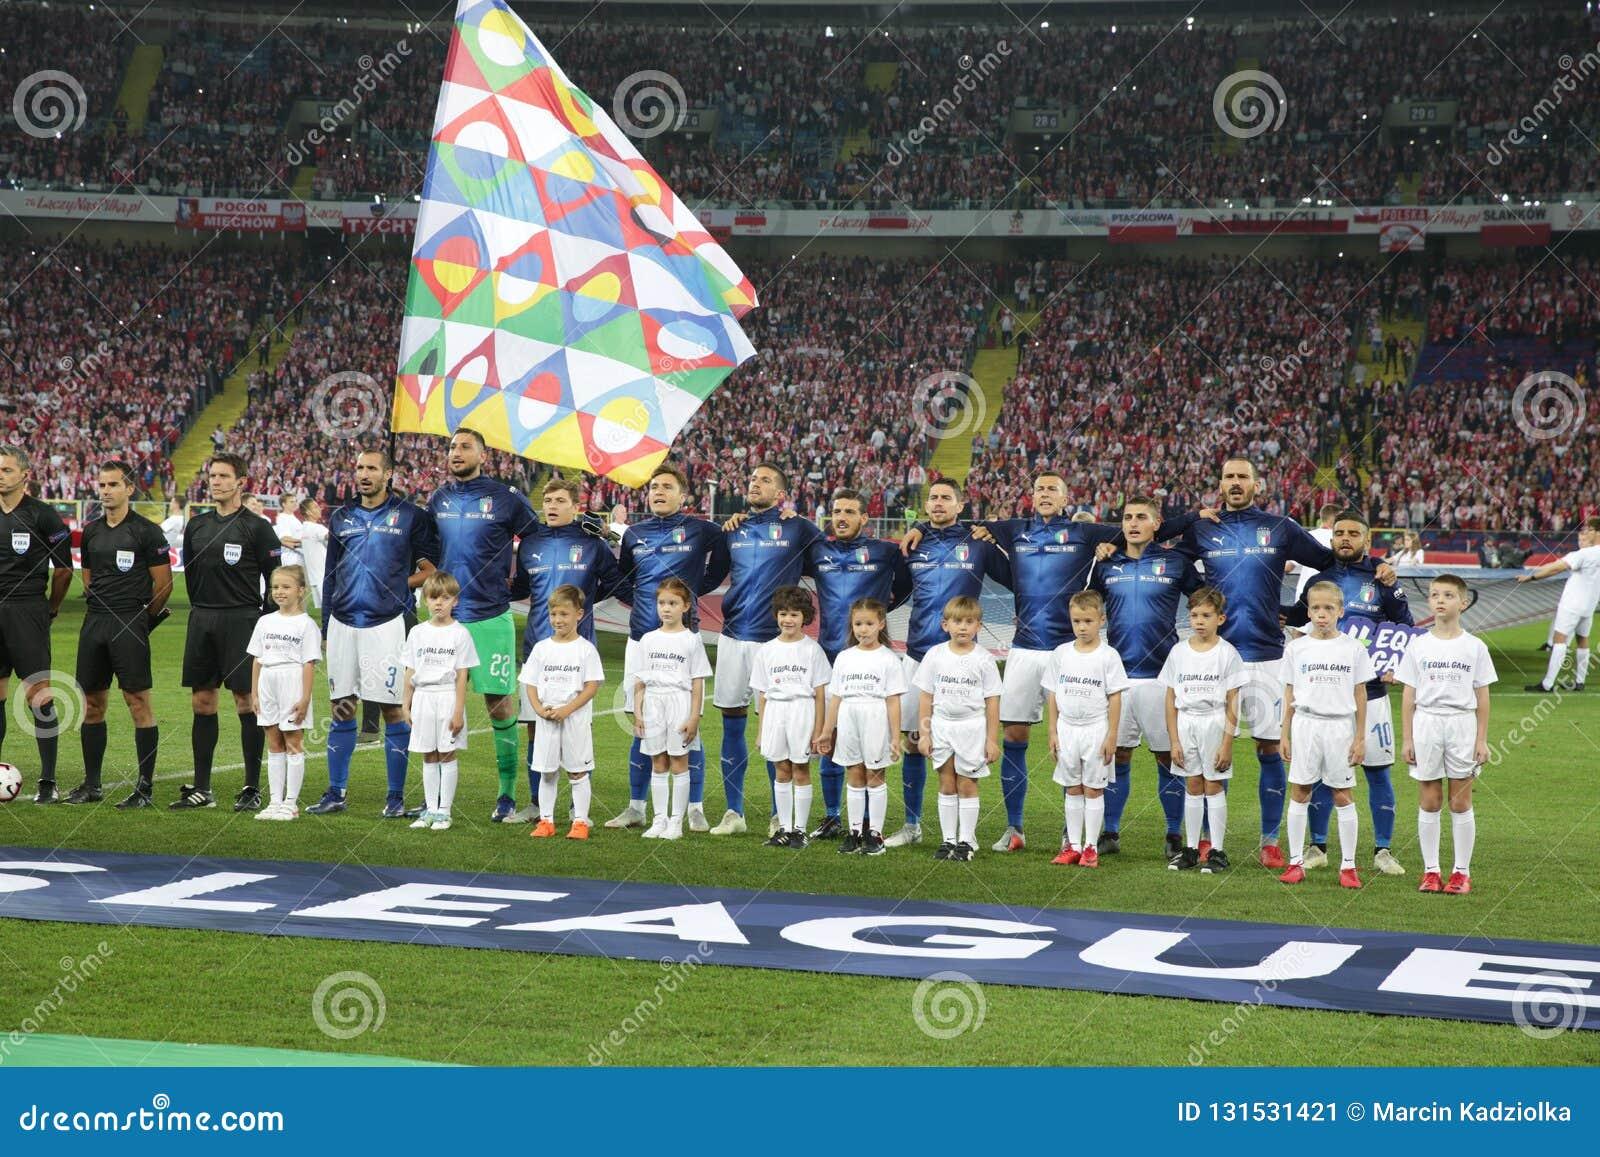 ¿Cuánto mide Alessandro Florenzi? - Real height Chorzow-poland-october-uefa-nations-league-poland-italy-o-p-gianluigi-donnarumma-giorgio-chiellini-marco-veratti-jorginho-lorenzo-131531421